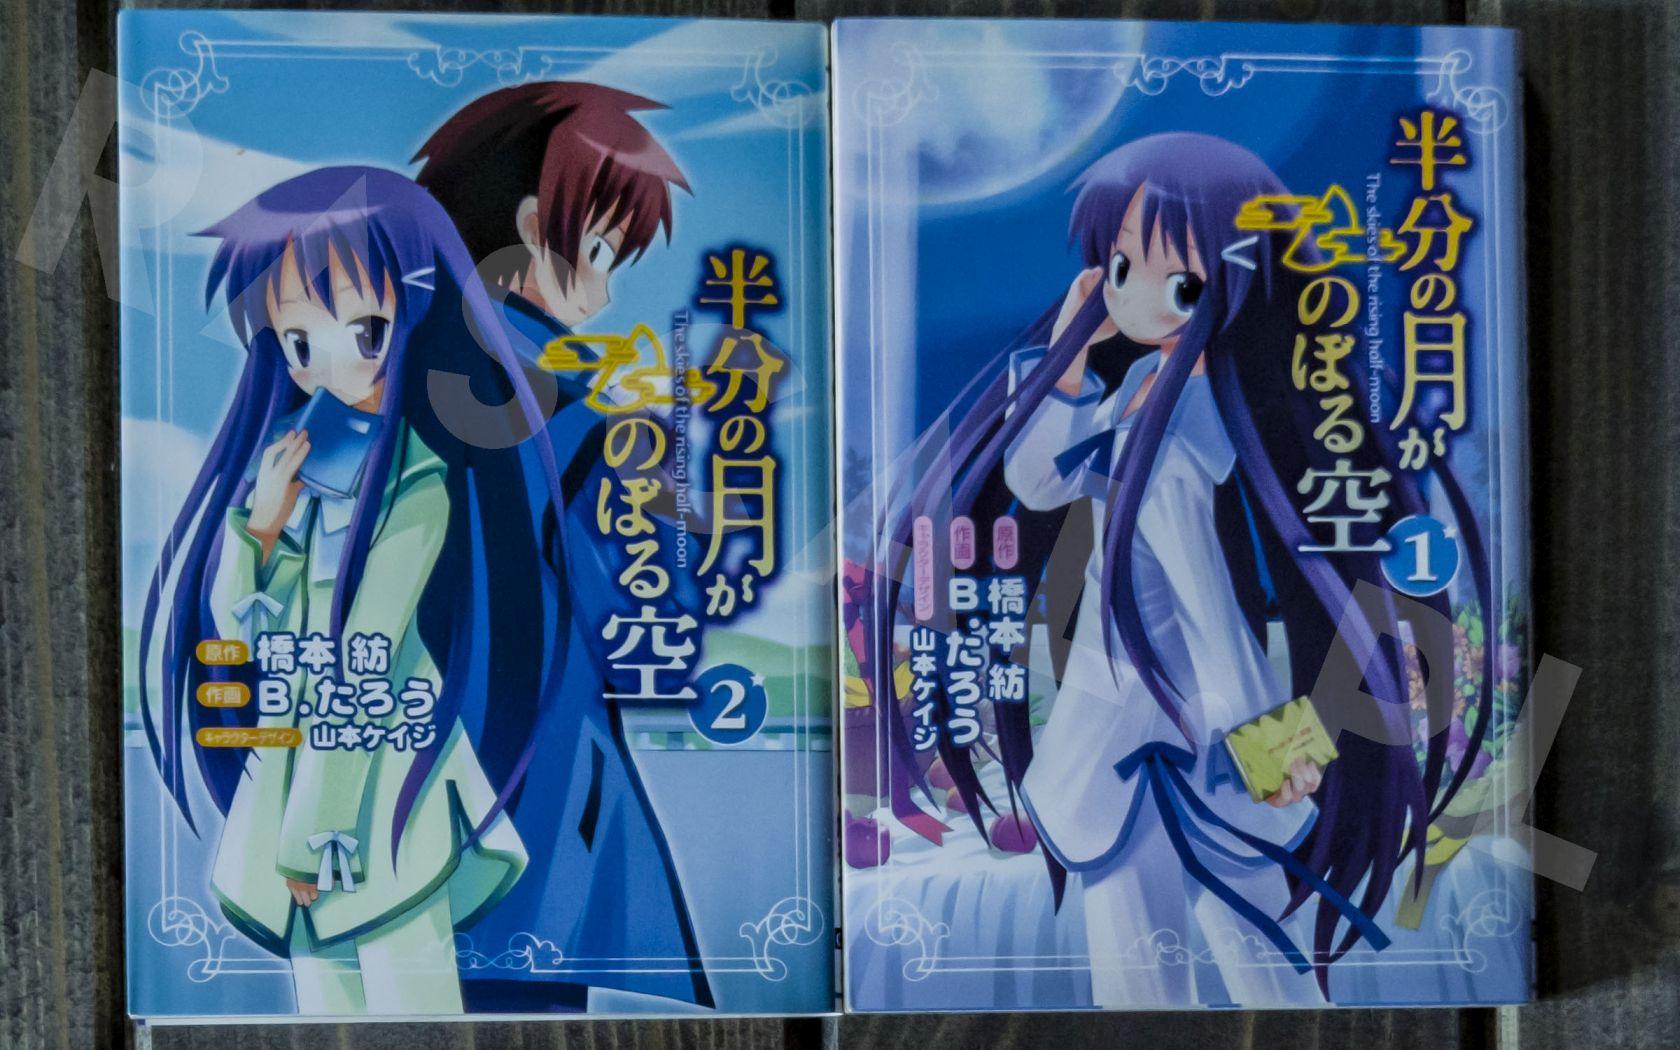 Hanbun no Tsuki ga Noboru Sora (1-2) - Dengeki Comics - Nowości w kolekcji mangi (listopad 2020) - rascal.pl